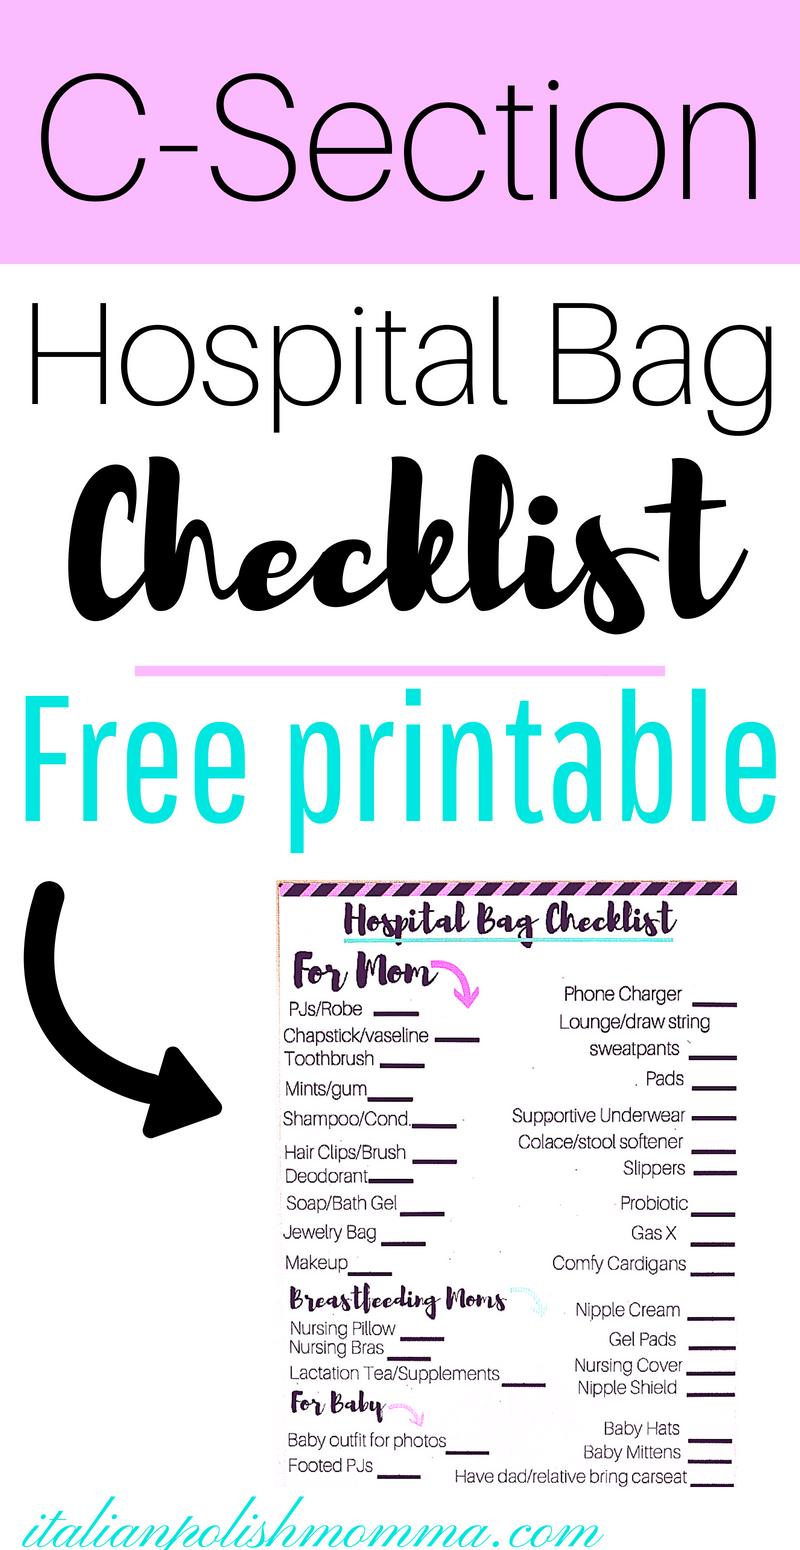 A Simple C Section Hospital Bag Checklist